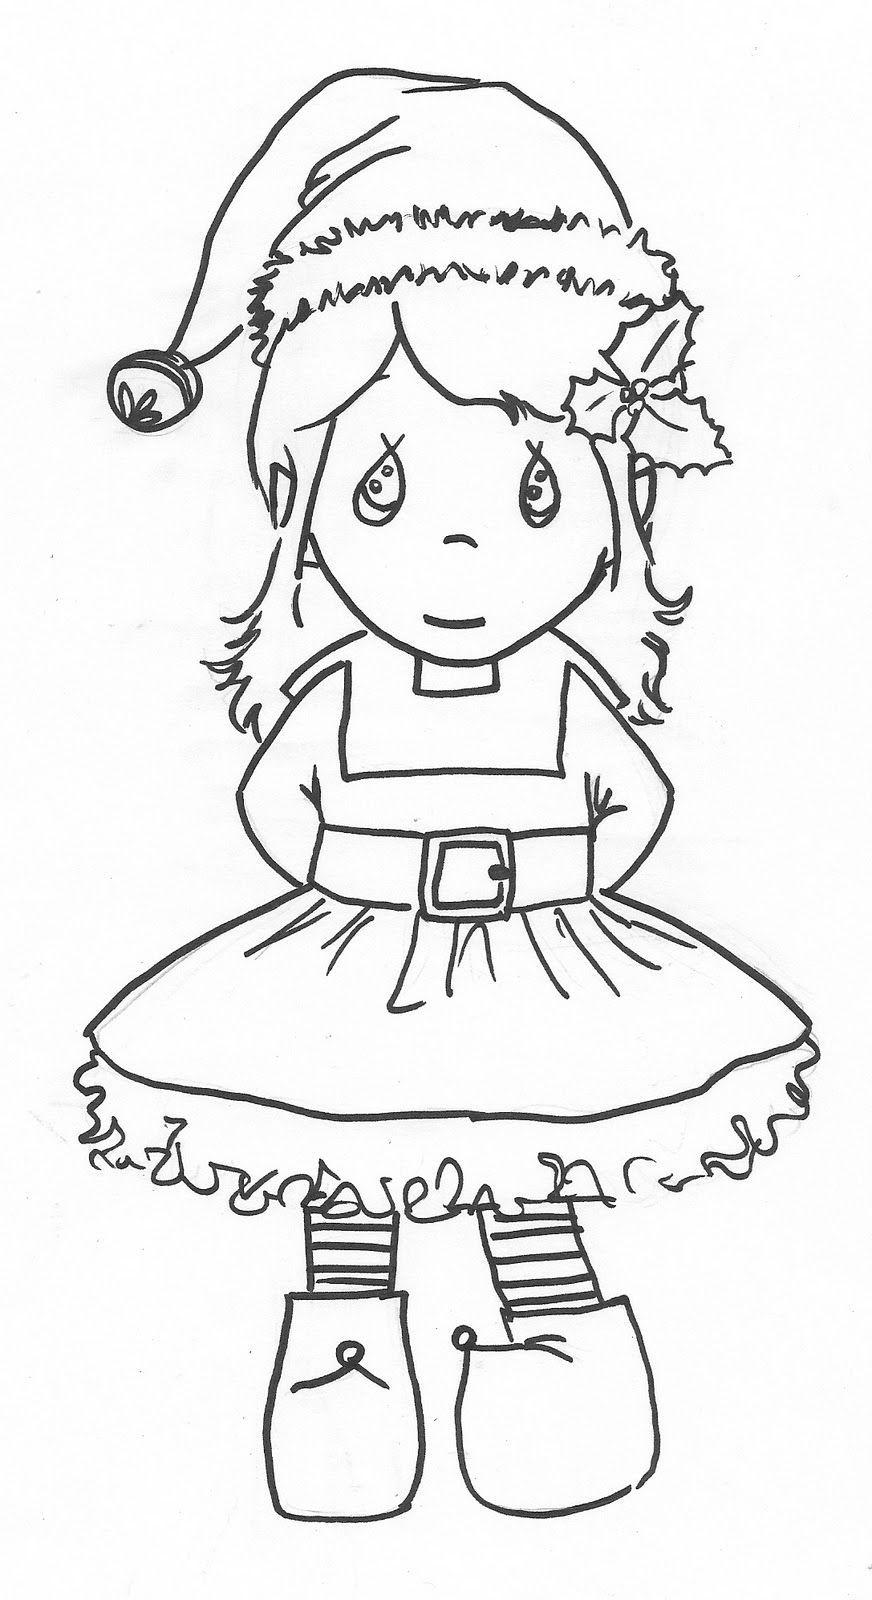 7bcd04235981ddc55b53121fe551bfba » Elf On The Shelf Coloring Anime